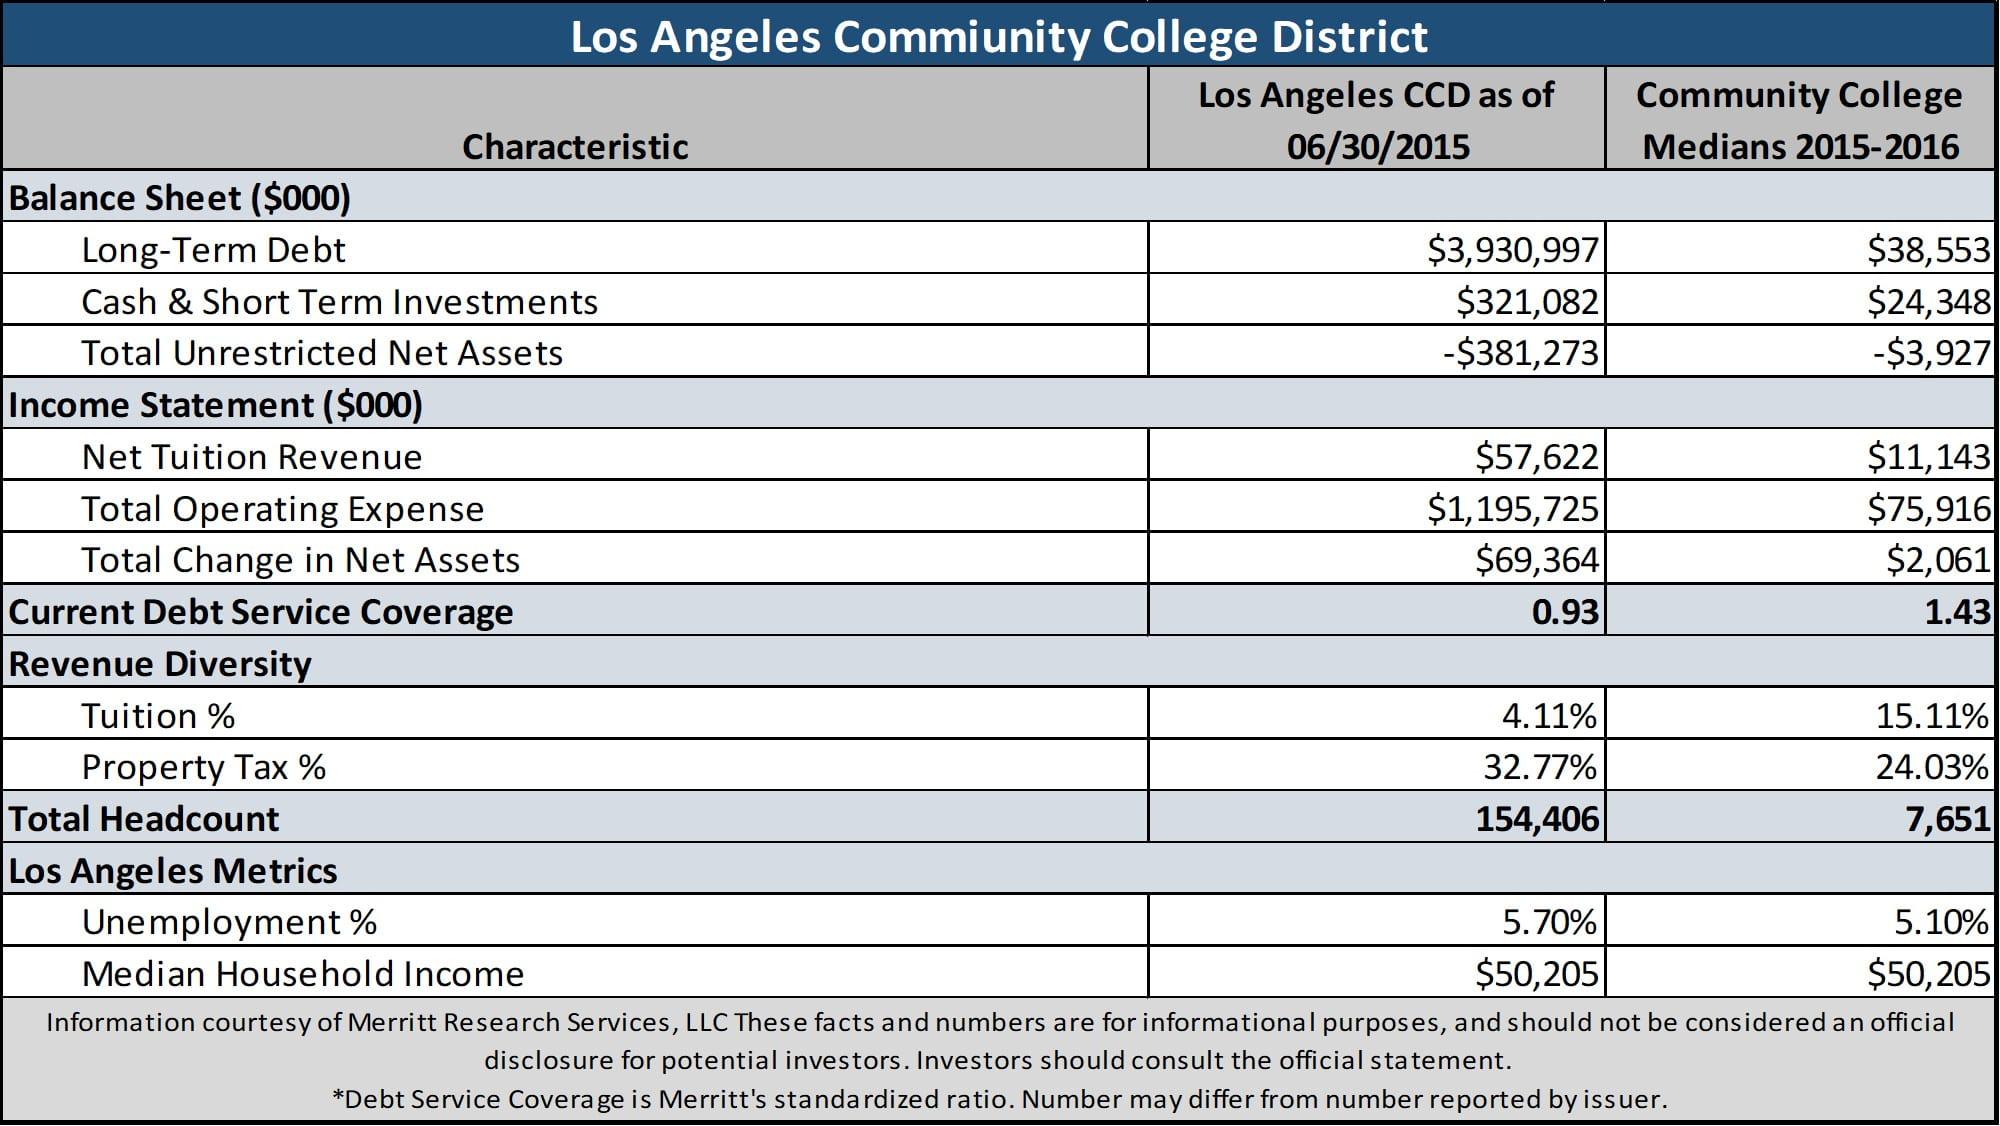 Los Angeles Community College